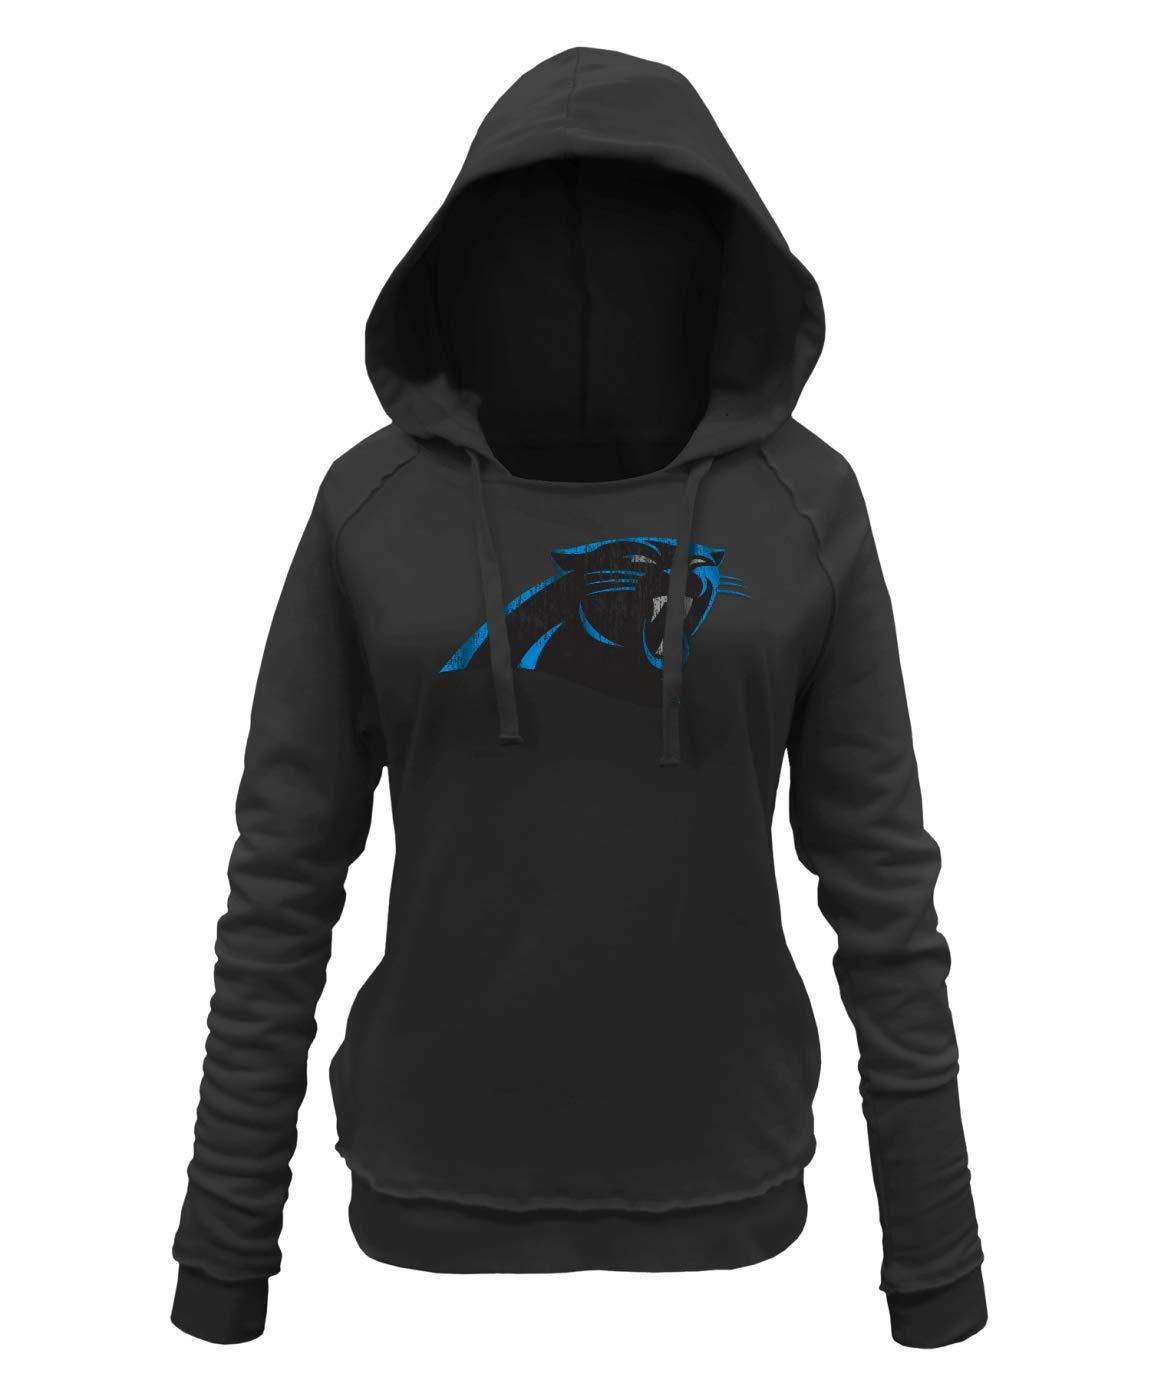 314d7b09 Amazon.com : New Era Carolina Panthers Women's NFL Post Route ...